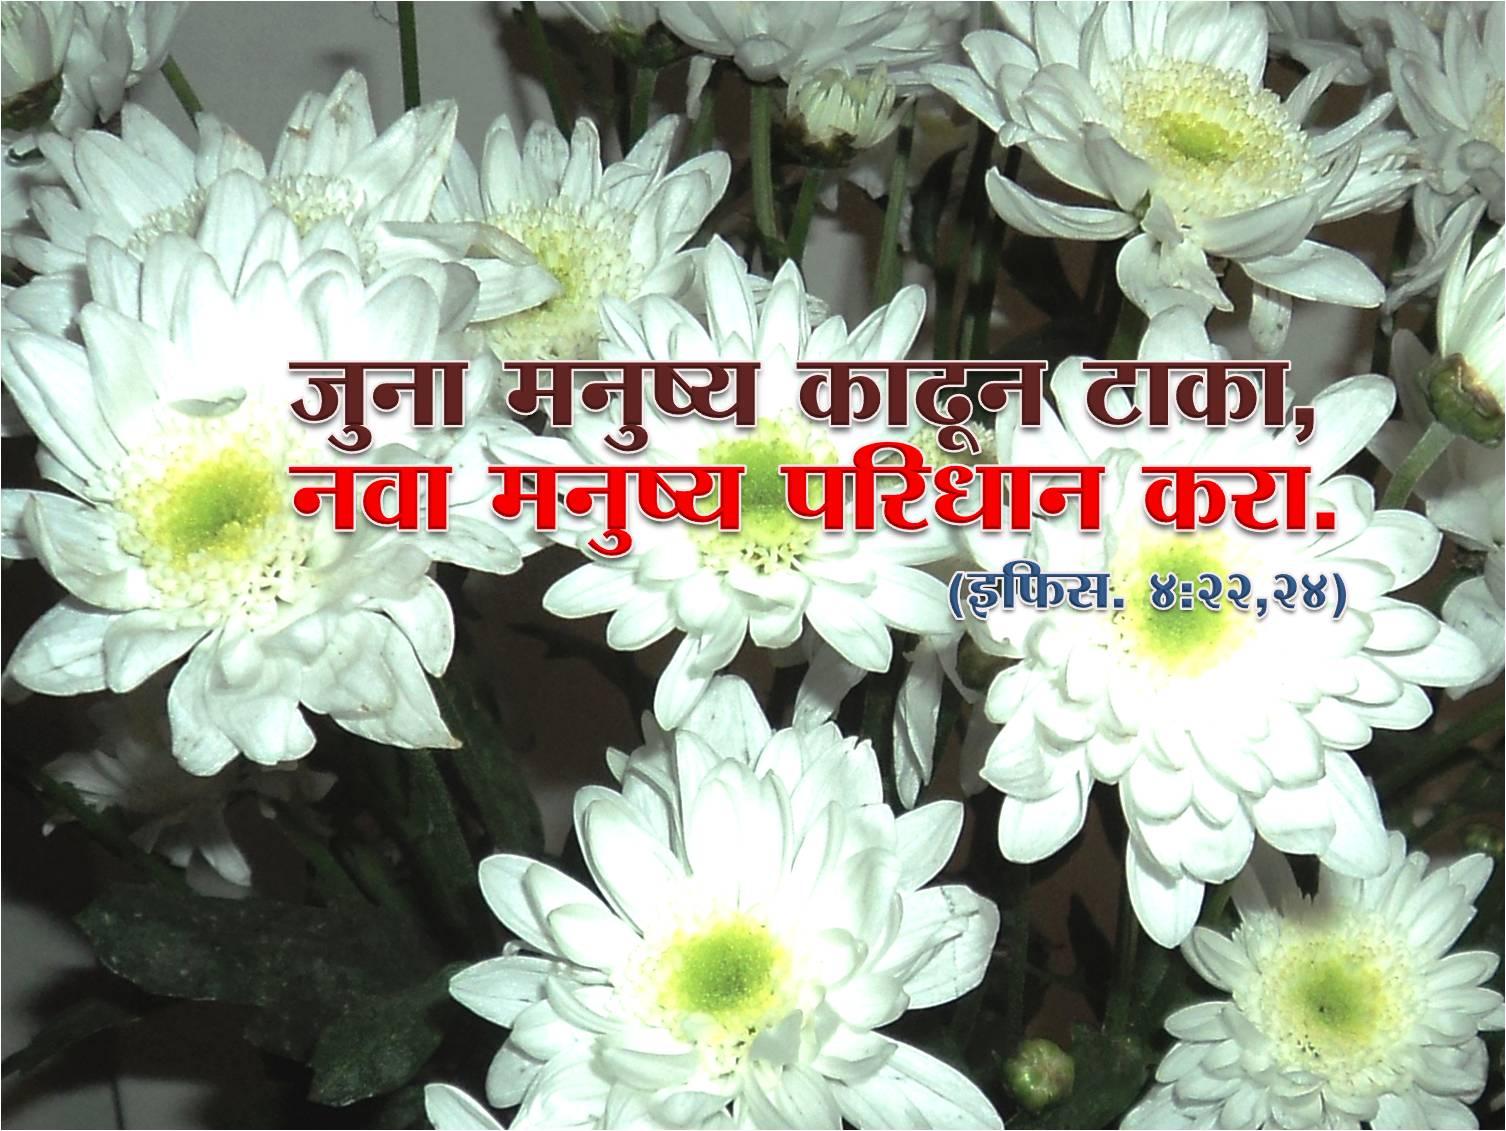 Marathi Bible Wallpaper for New Year 2013  Nava Karar (Marathi